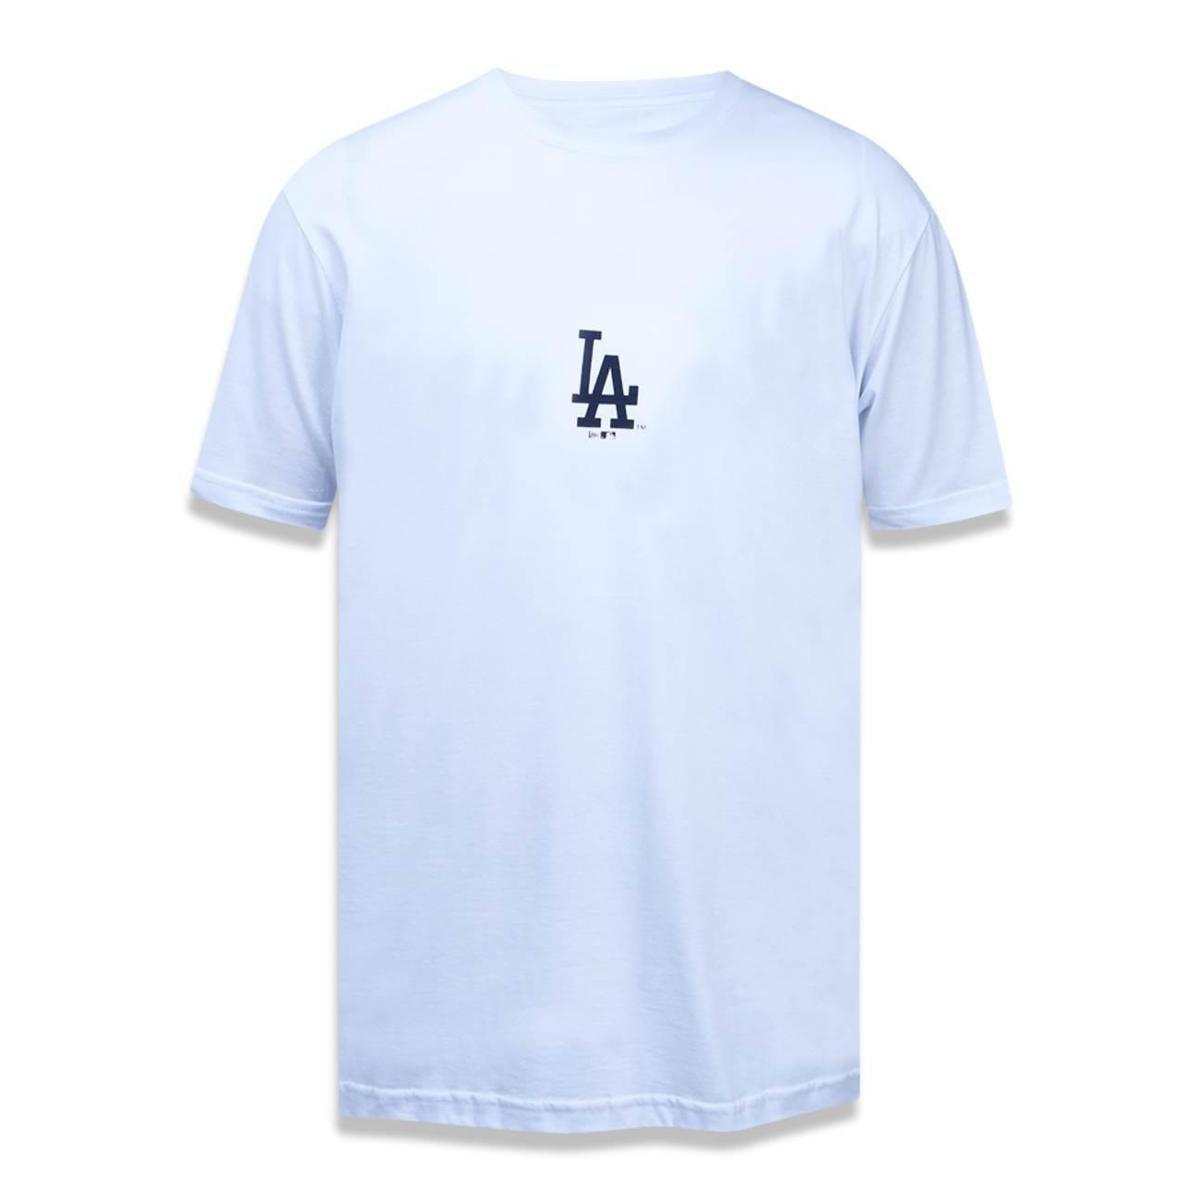 f71a83b2f8971 Camiseta Los Angeles Dodgers MLB New Era Masculina - Branco - Compre Agora